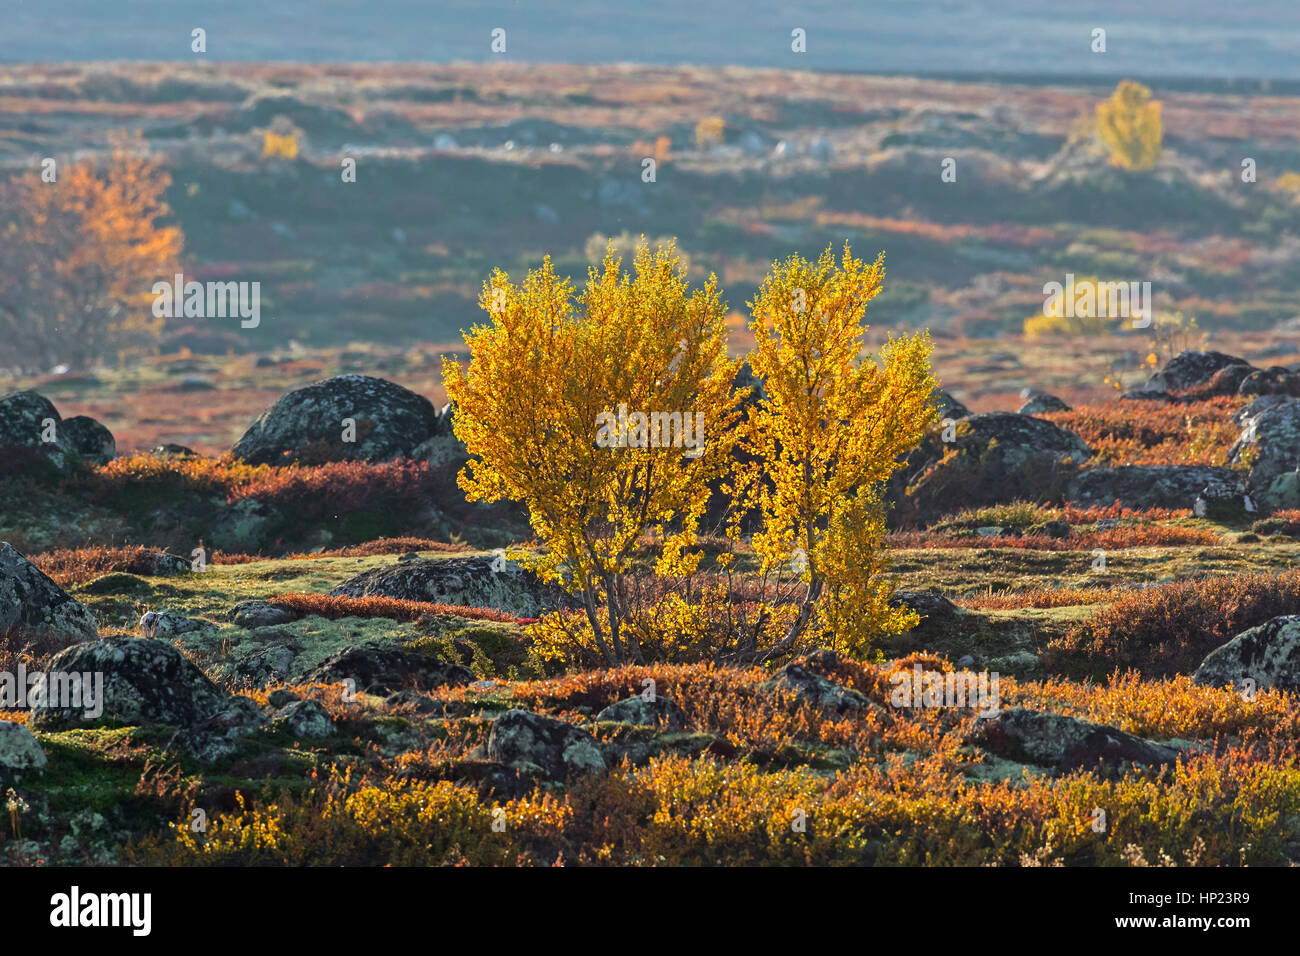 Europäische Weiße Birken / downy Birke / moor-Birke (Betula Pubescens / Betula Alba) in der Tundra im Stockbild